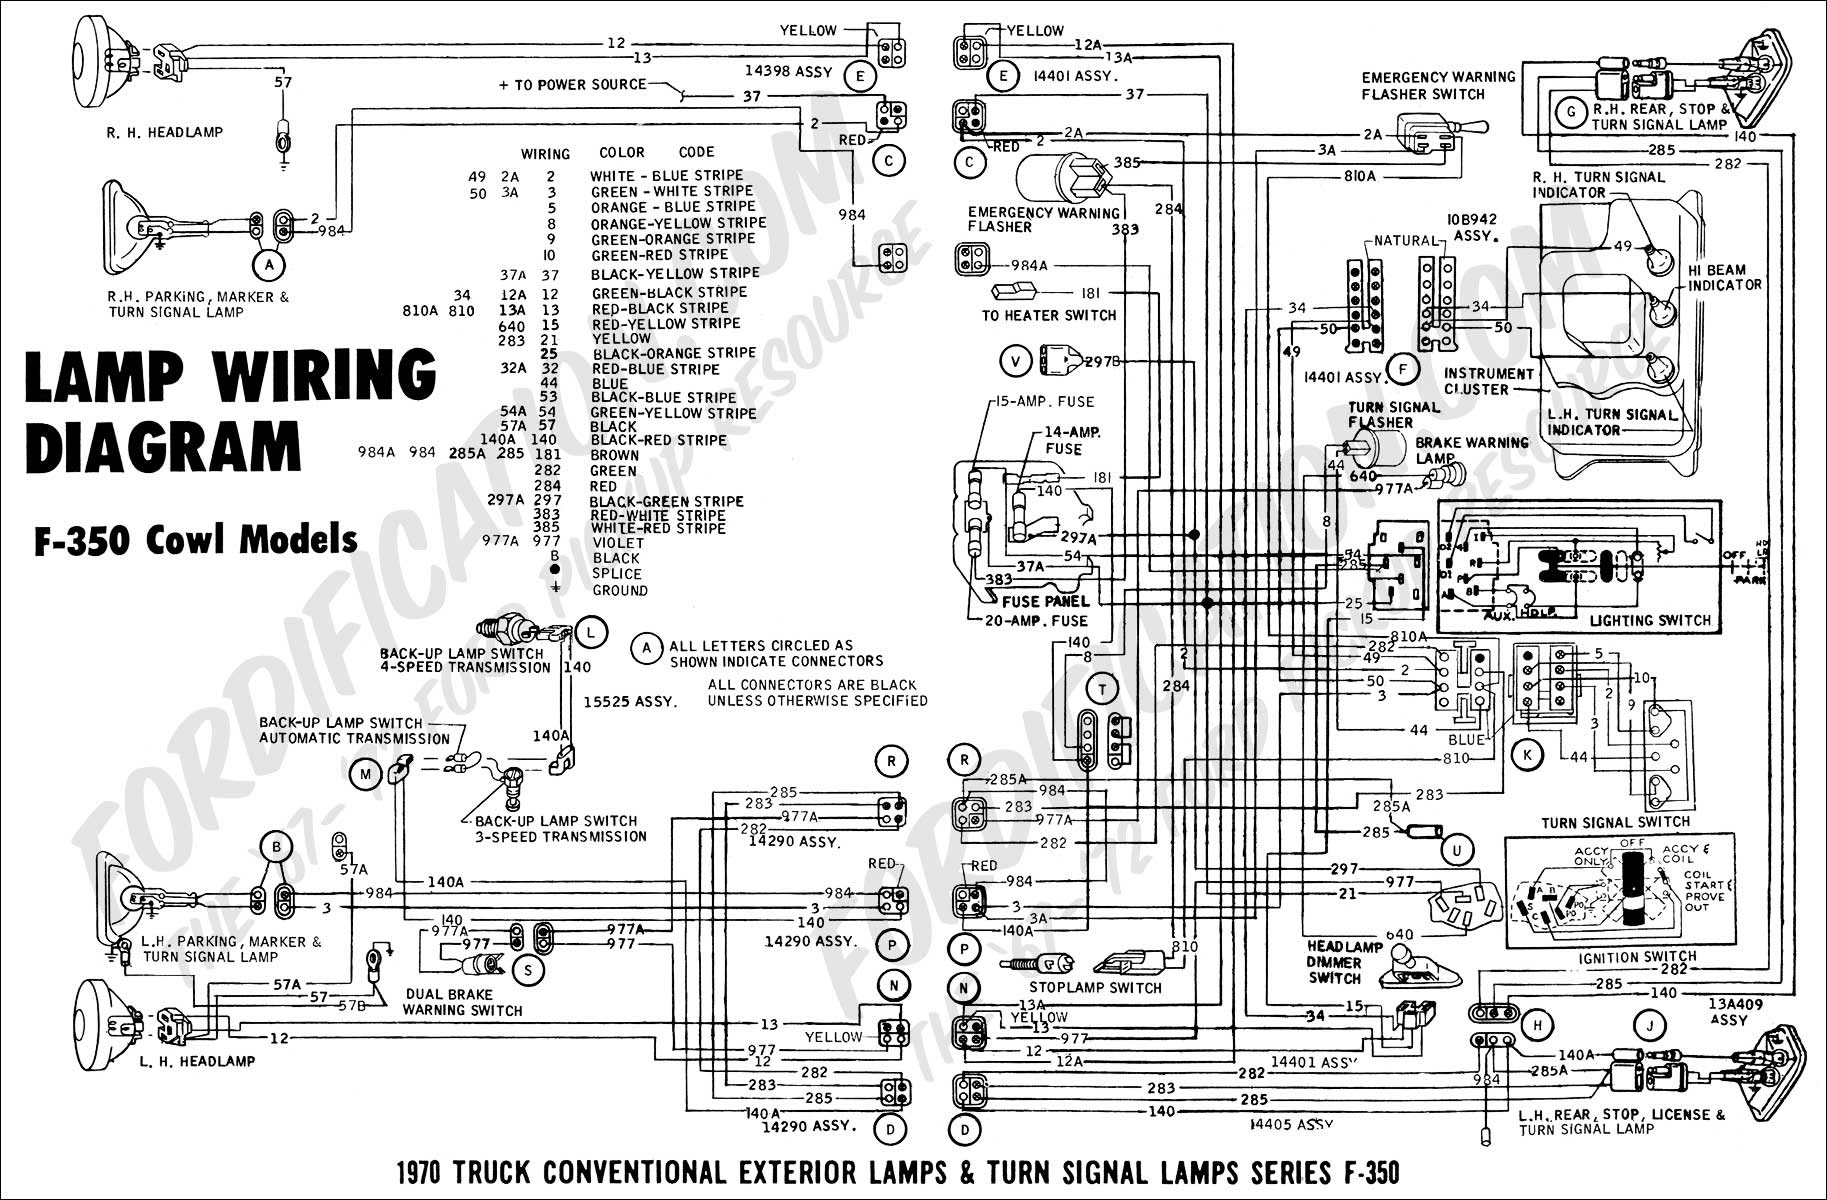 1997 Ford F 450 Wiring Diagram E Starter Wiring Diagram 1976 Chevy Nova Begeboy Wiring Diagram Source